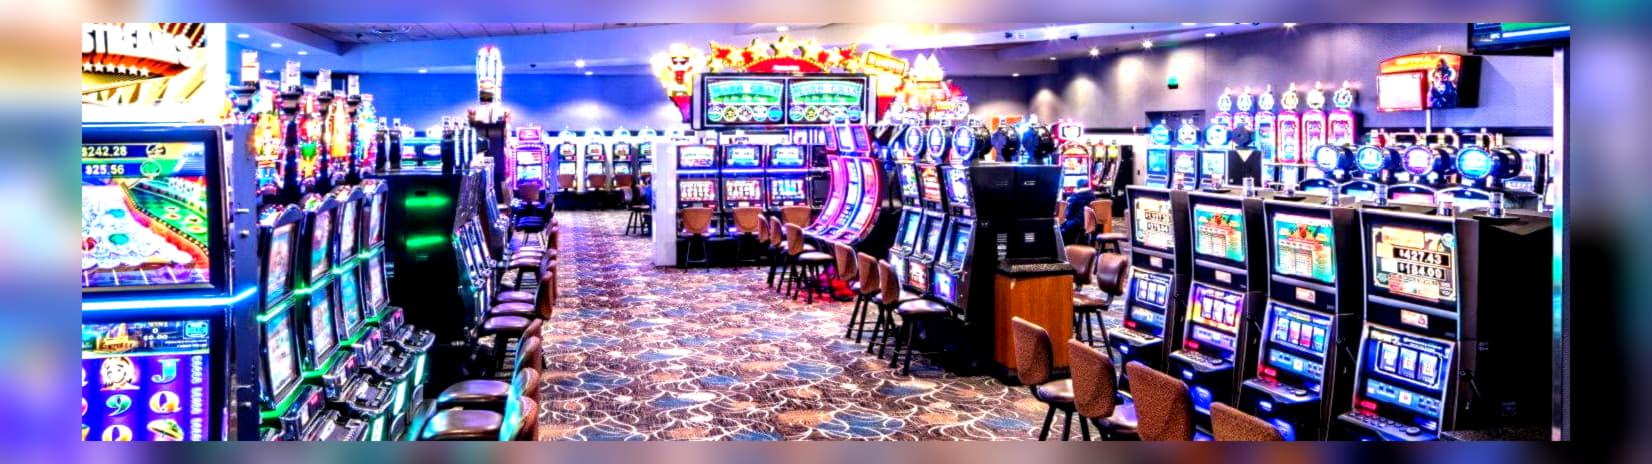 Eur 3165 ไม่มีคาสิโนโบนัสเงินฝากที่ Liberty Slots Casino